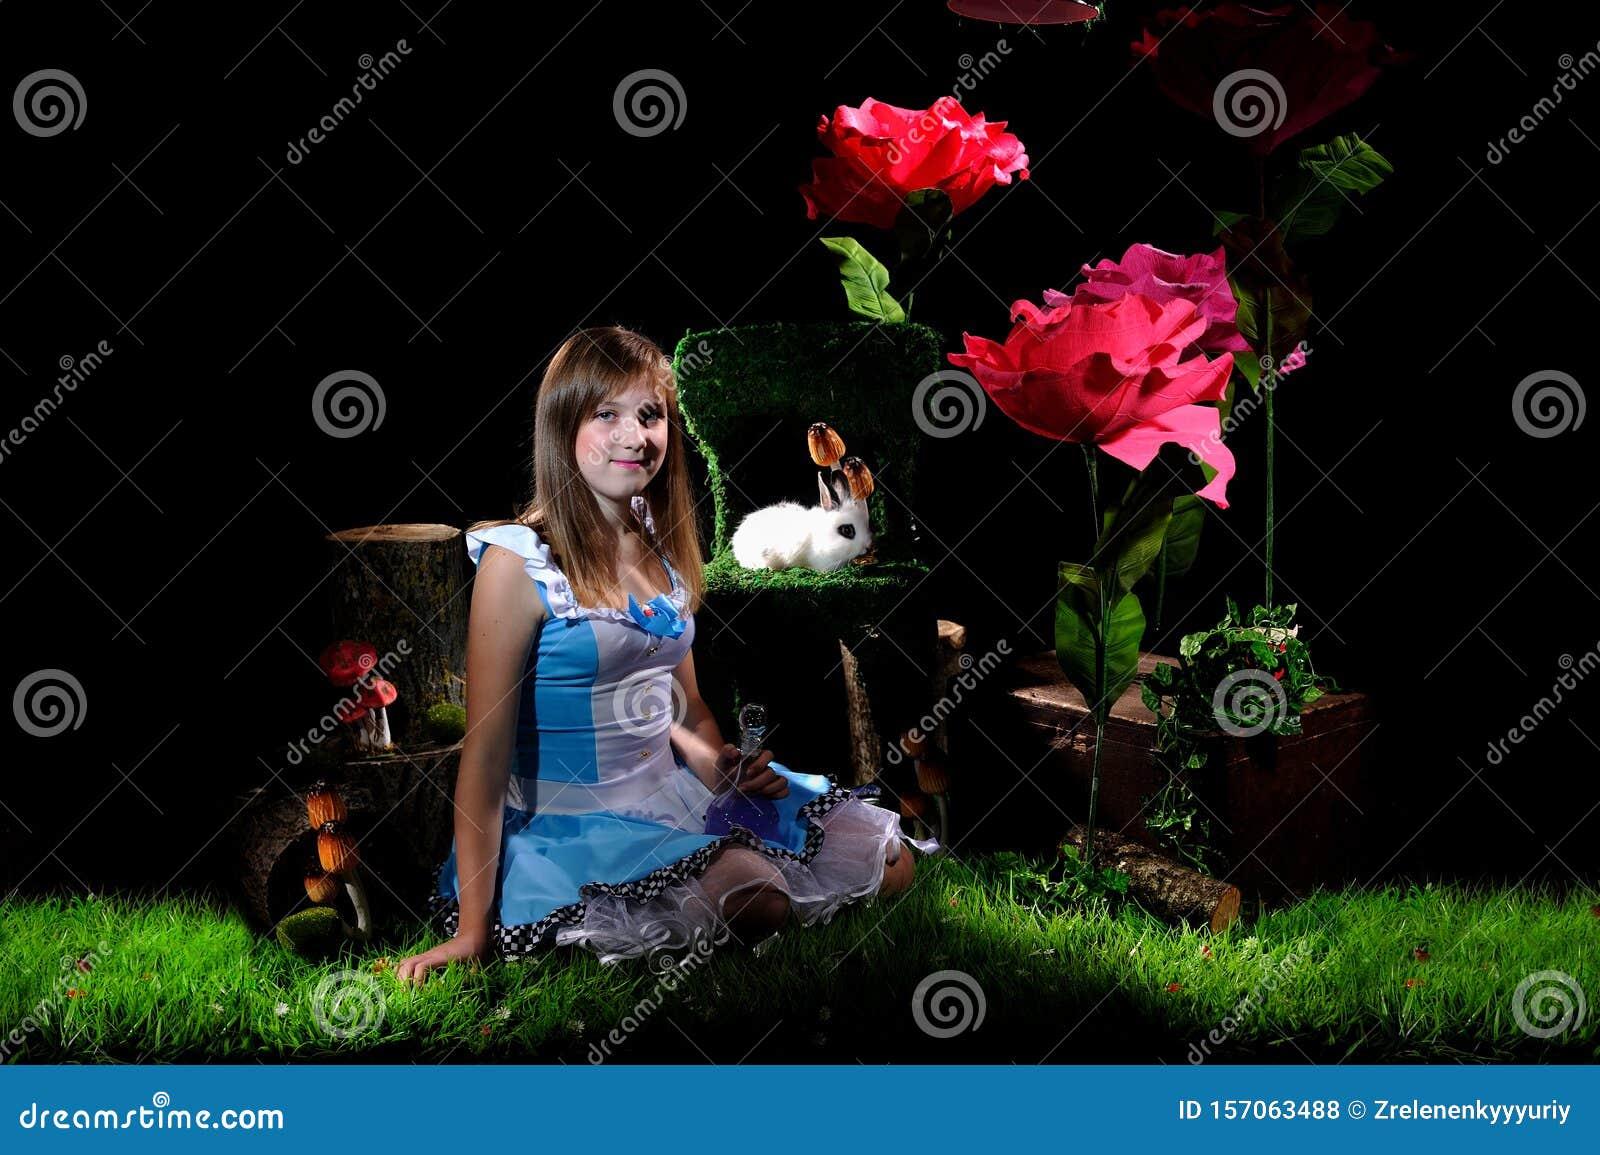 Alice In Wonderland Stock Photo Image Of Magic Concept 157063488